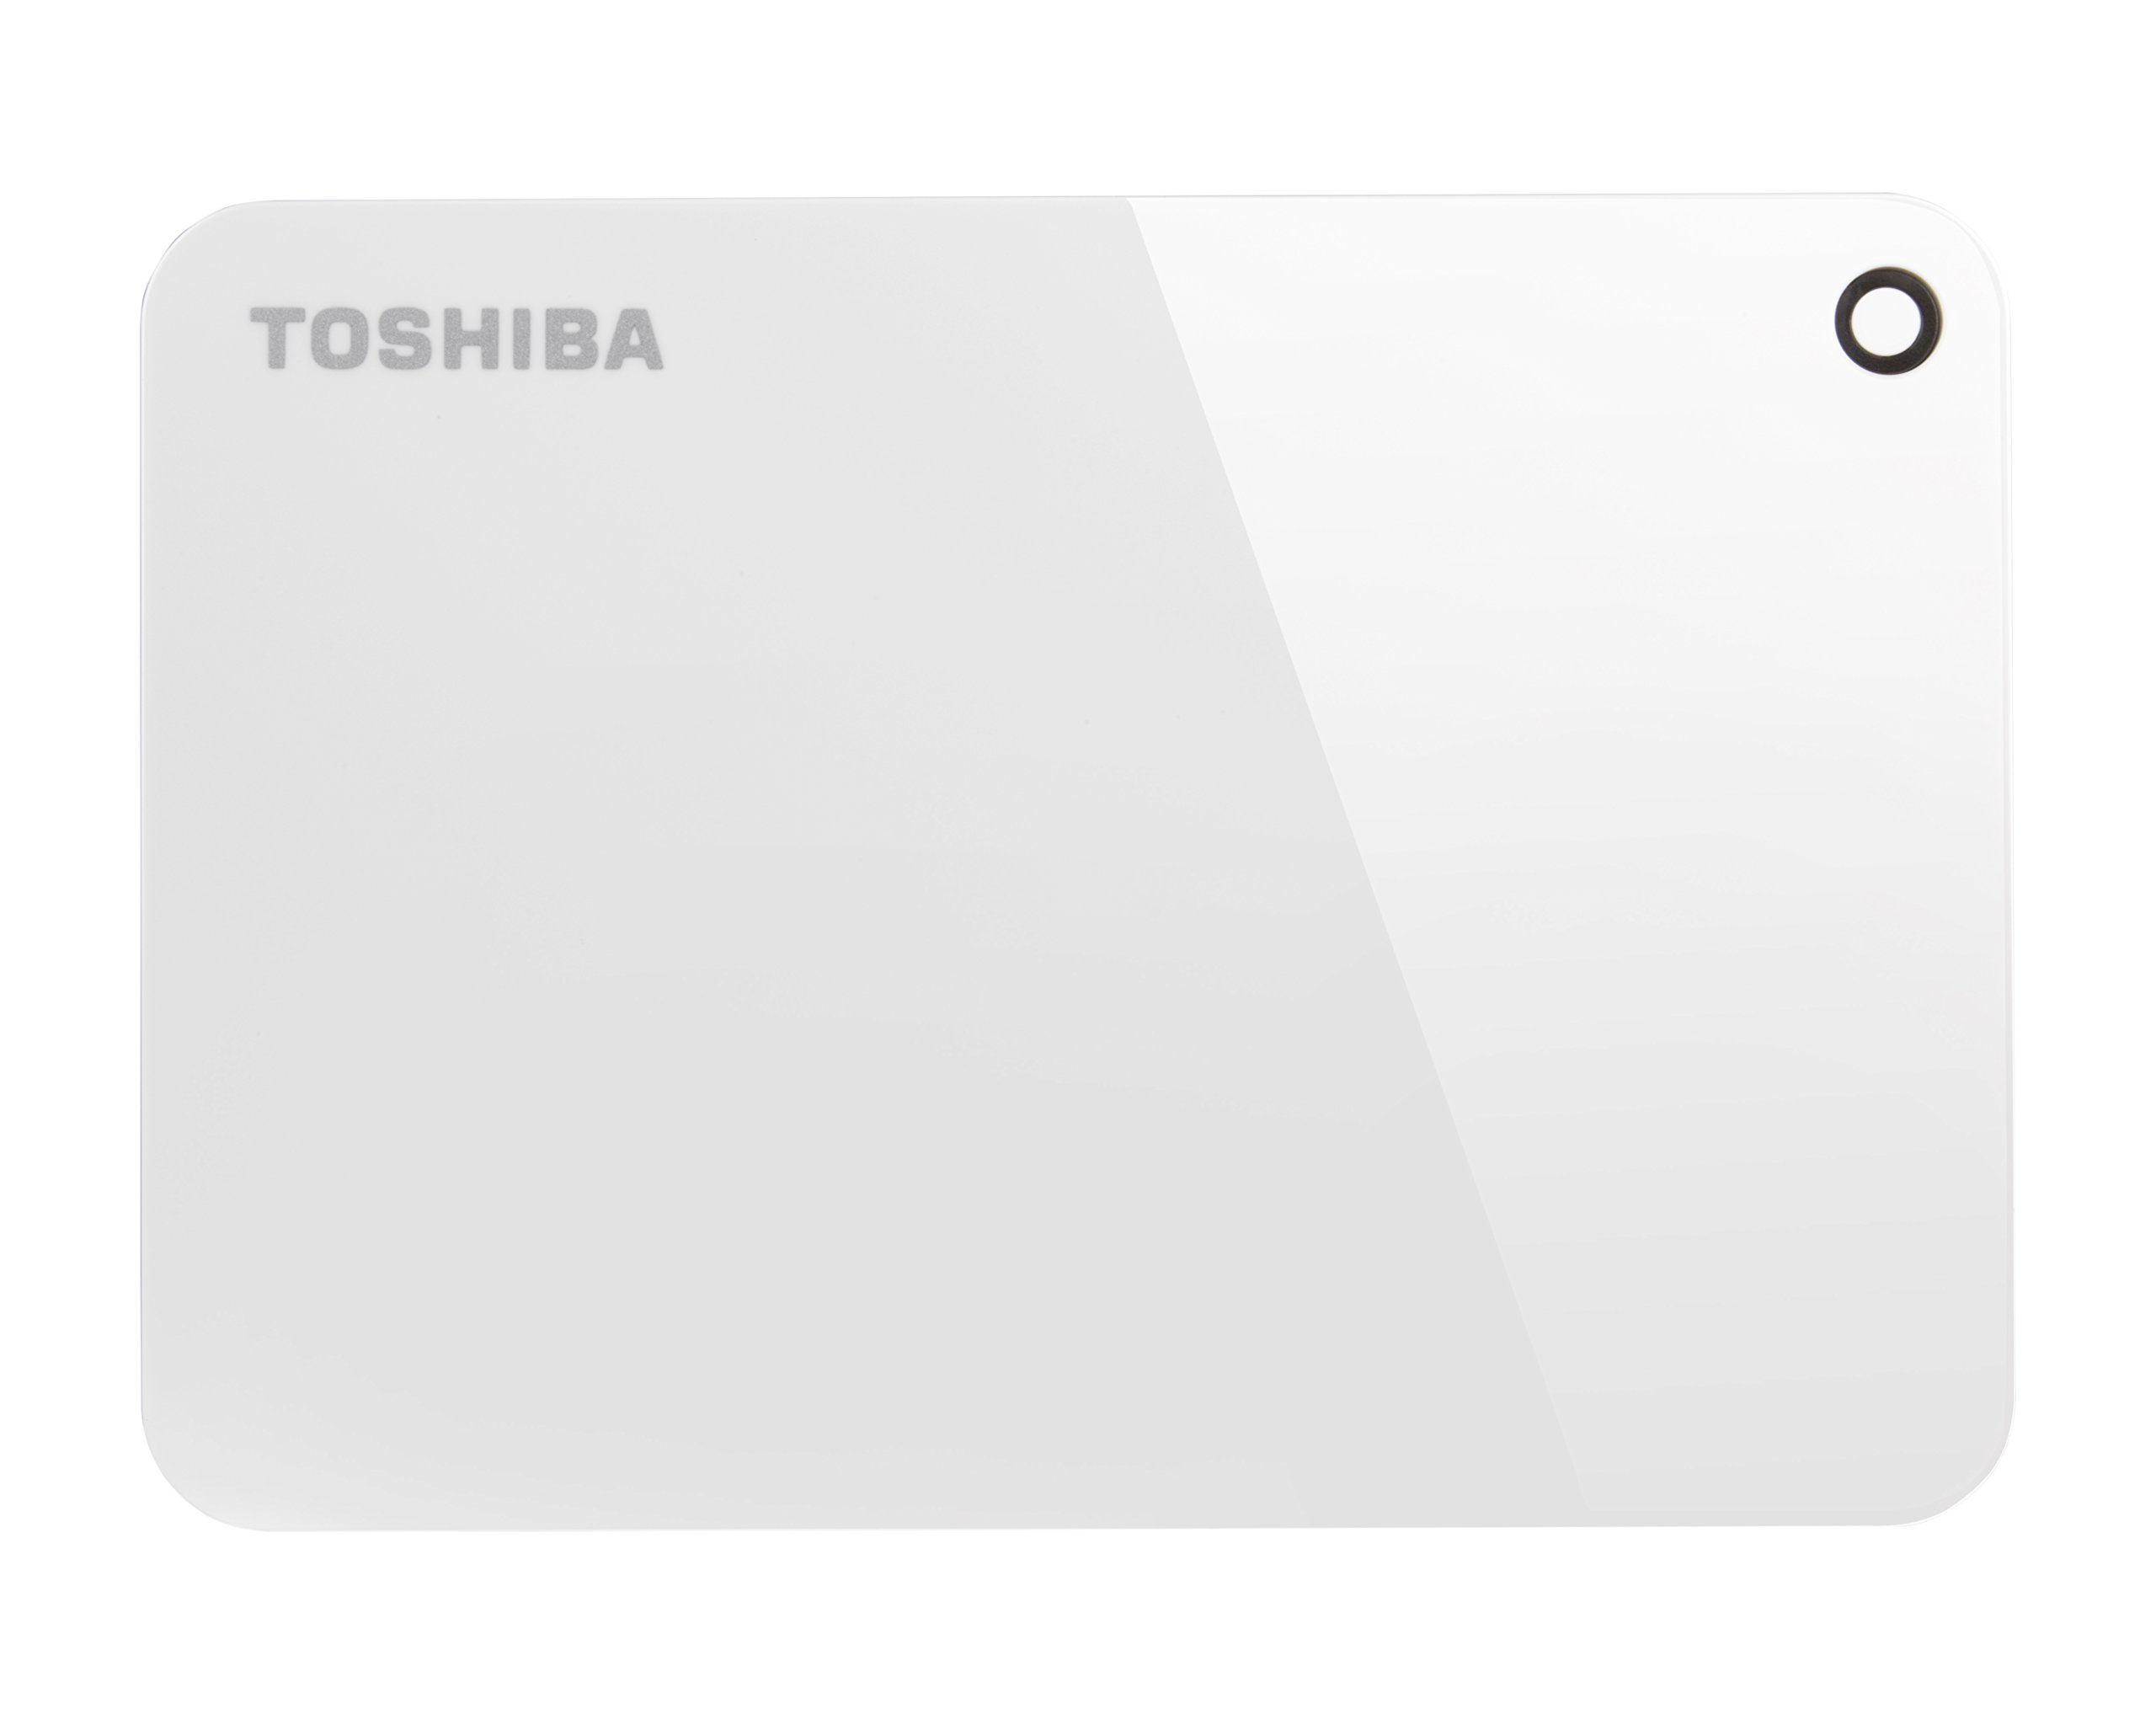 Toshiba Canvio Advance 1TB Portable External Hard Drive USB 3.0, White (HDTC910XW3AA) by Toshiba (Image #2)